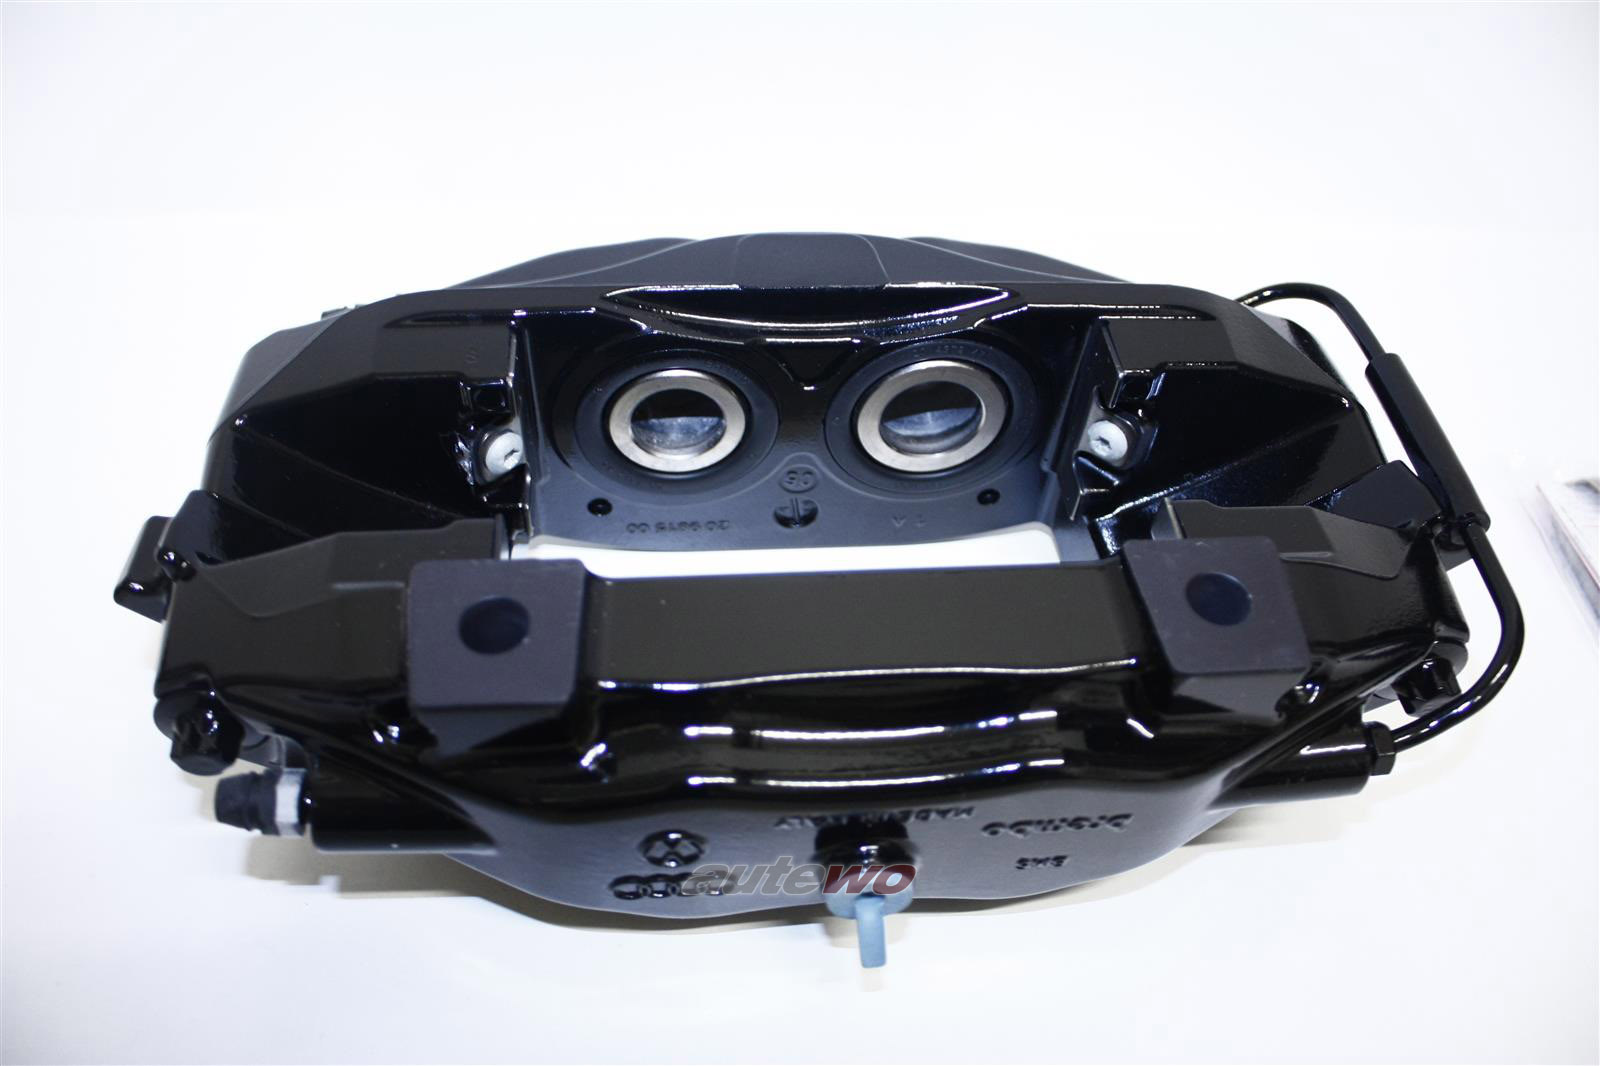 NEU! Audi R8 Orig. Festsattel Bremse 356x32mm Hi. Li. & Re. schwarz 420615407 &